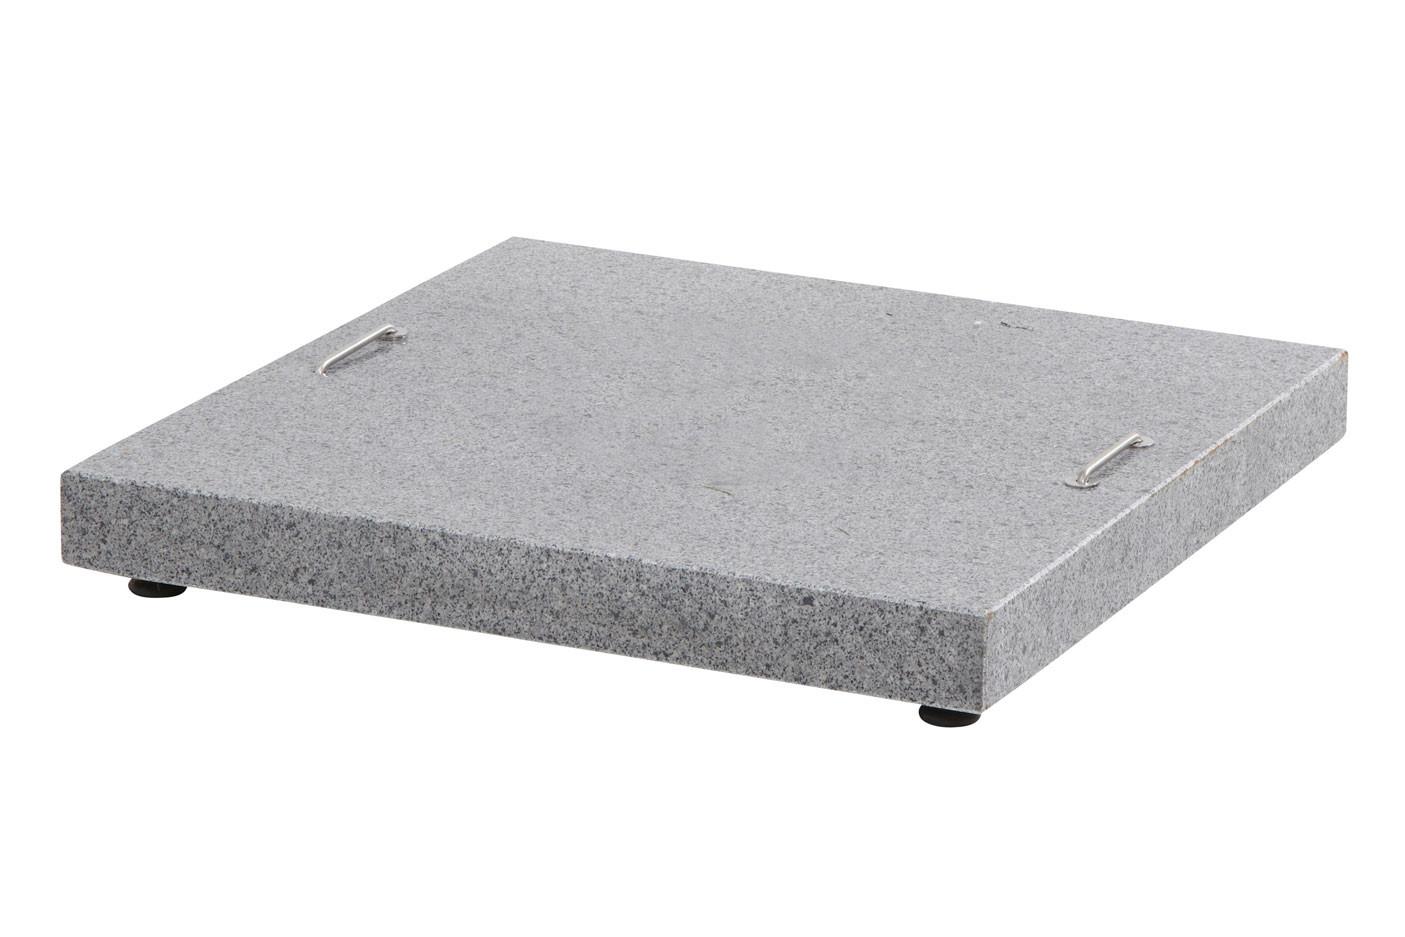 Granite base Anthracite 125 kgs.